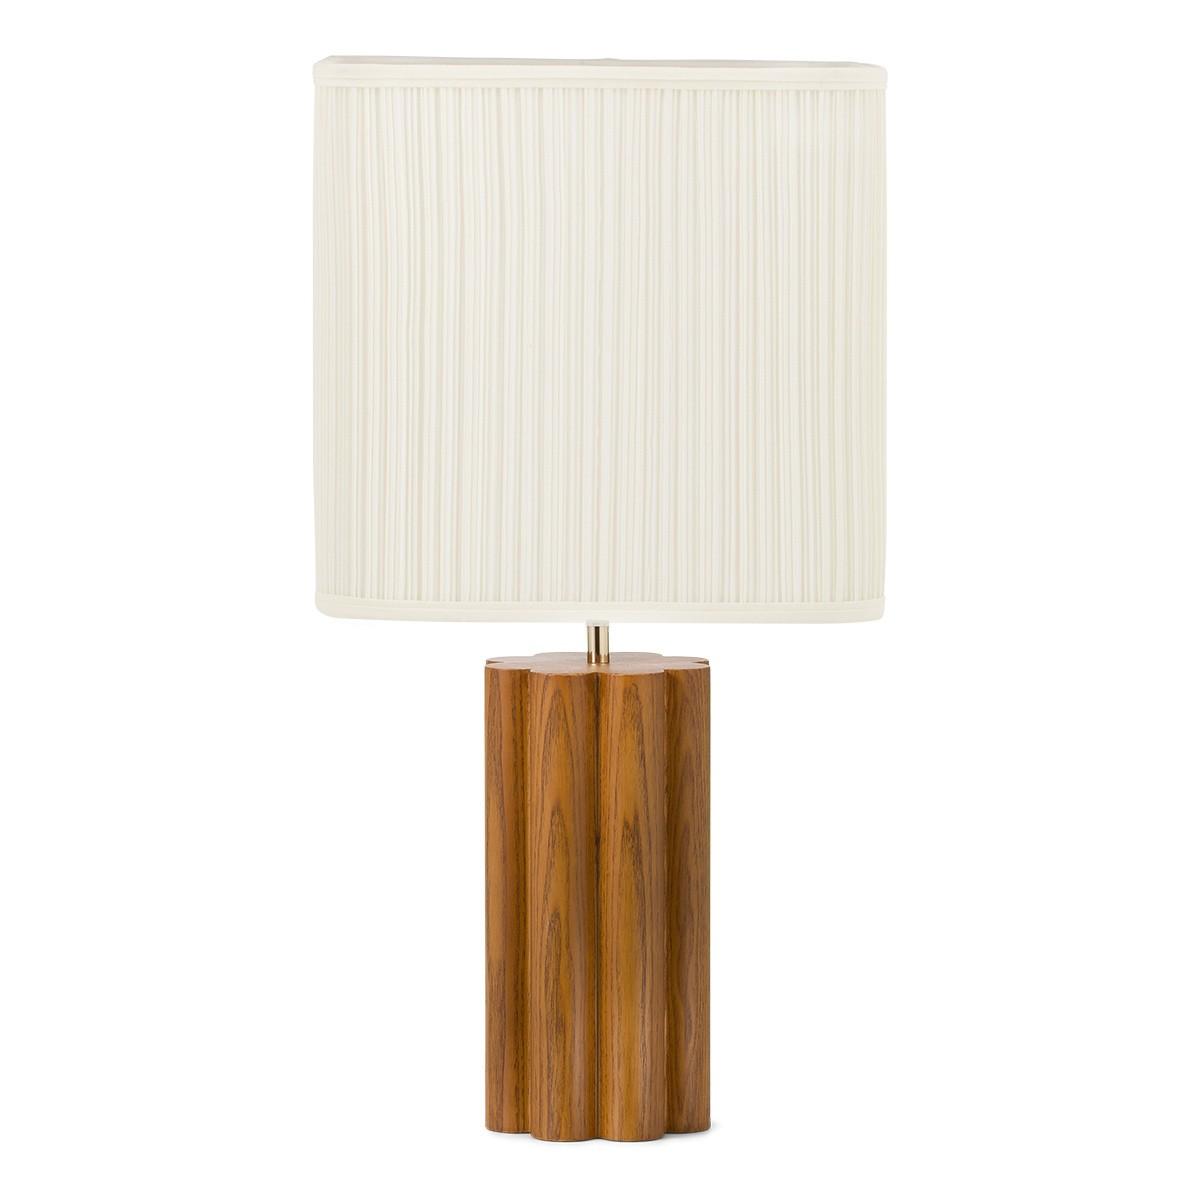 Gioia Table Lamp, Ash Wood with Iroko Finish